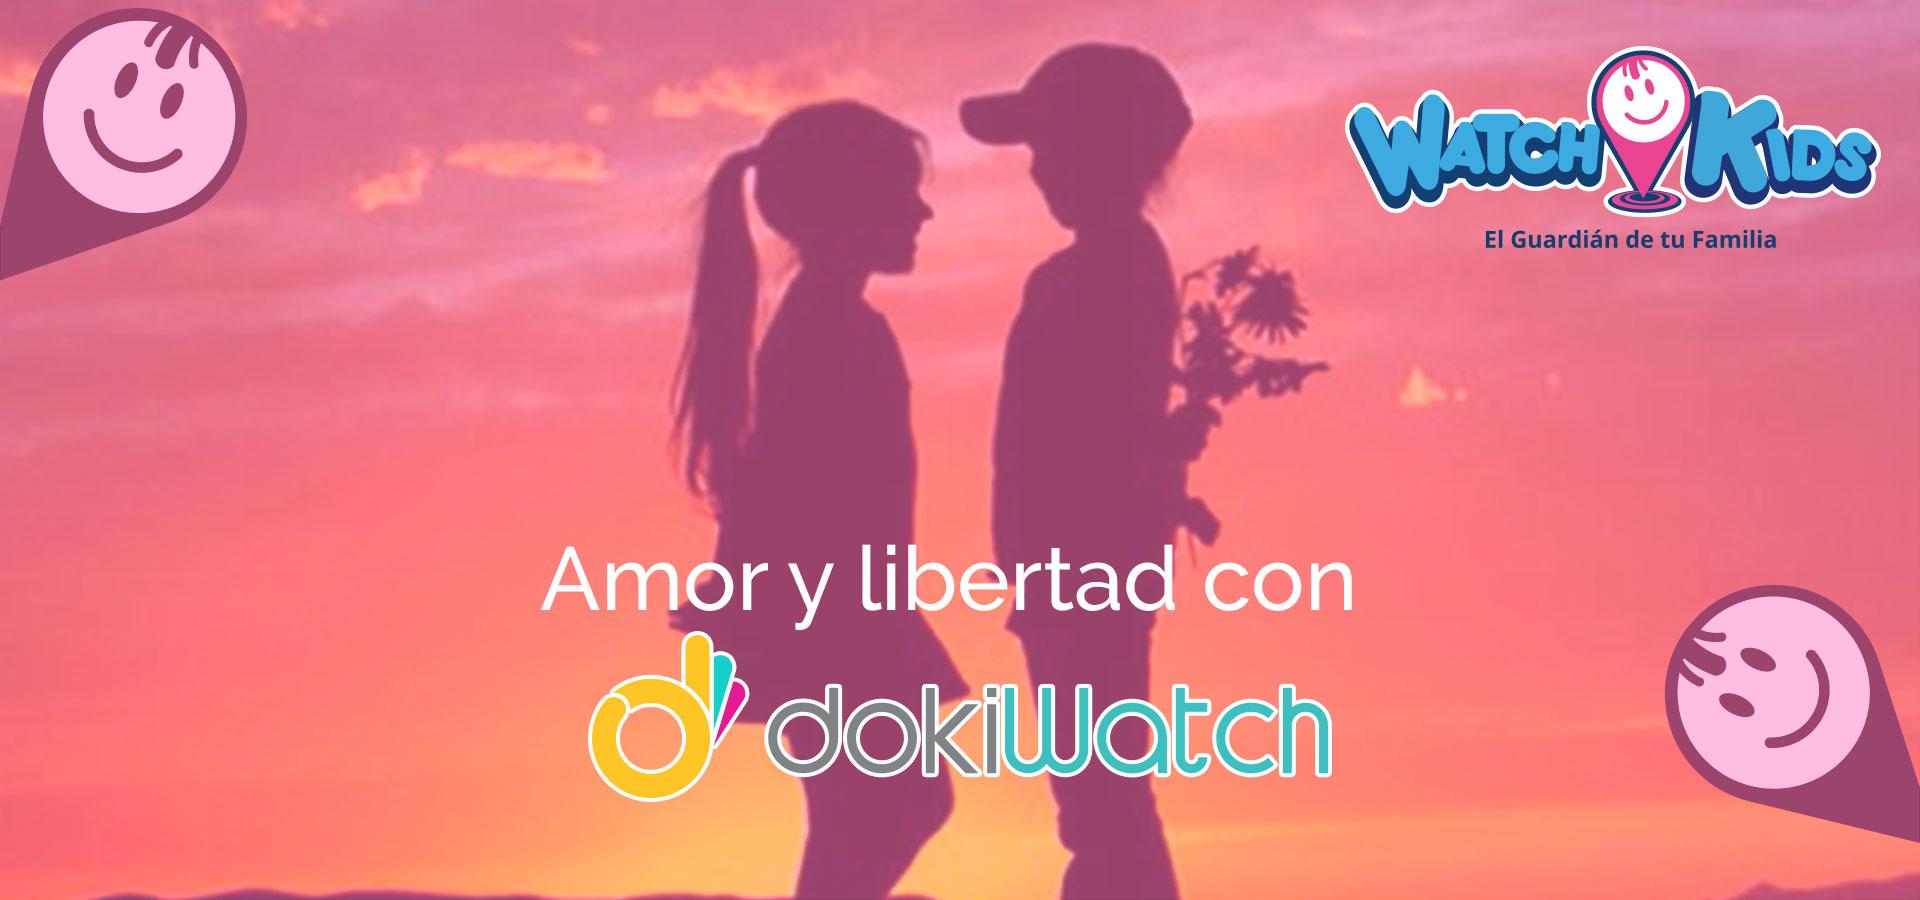 watchkids.com-amorylibertad-febrero2018